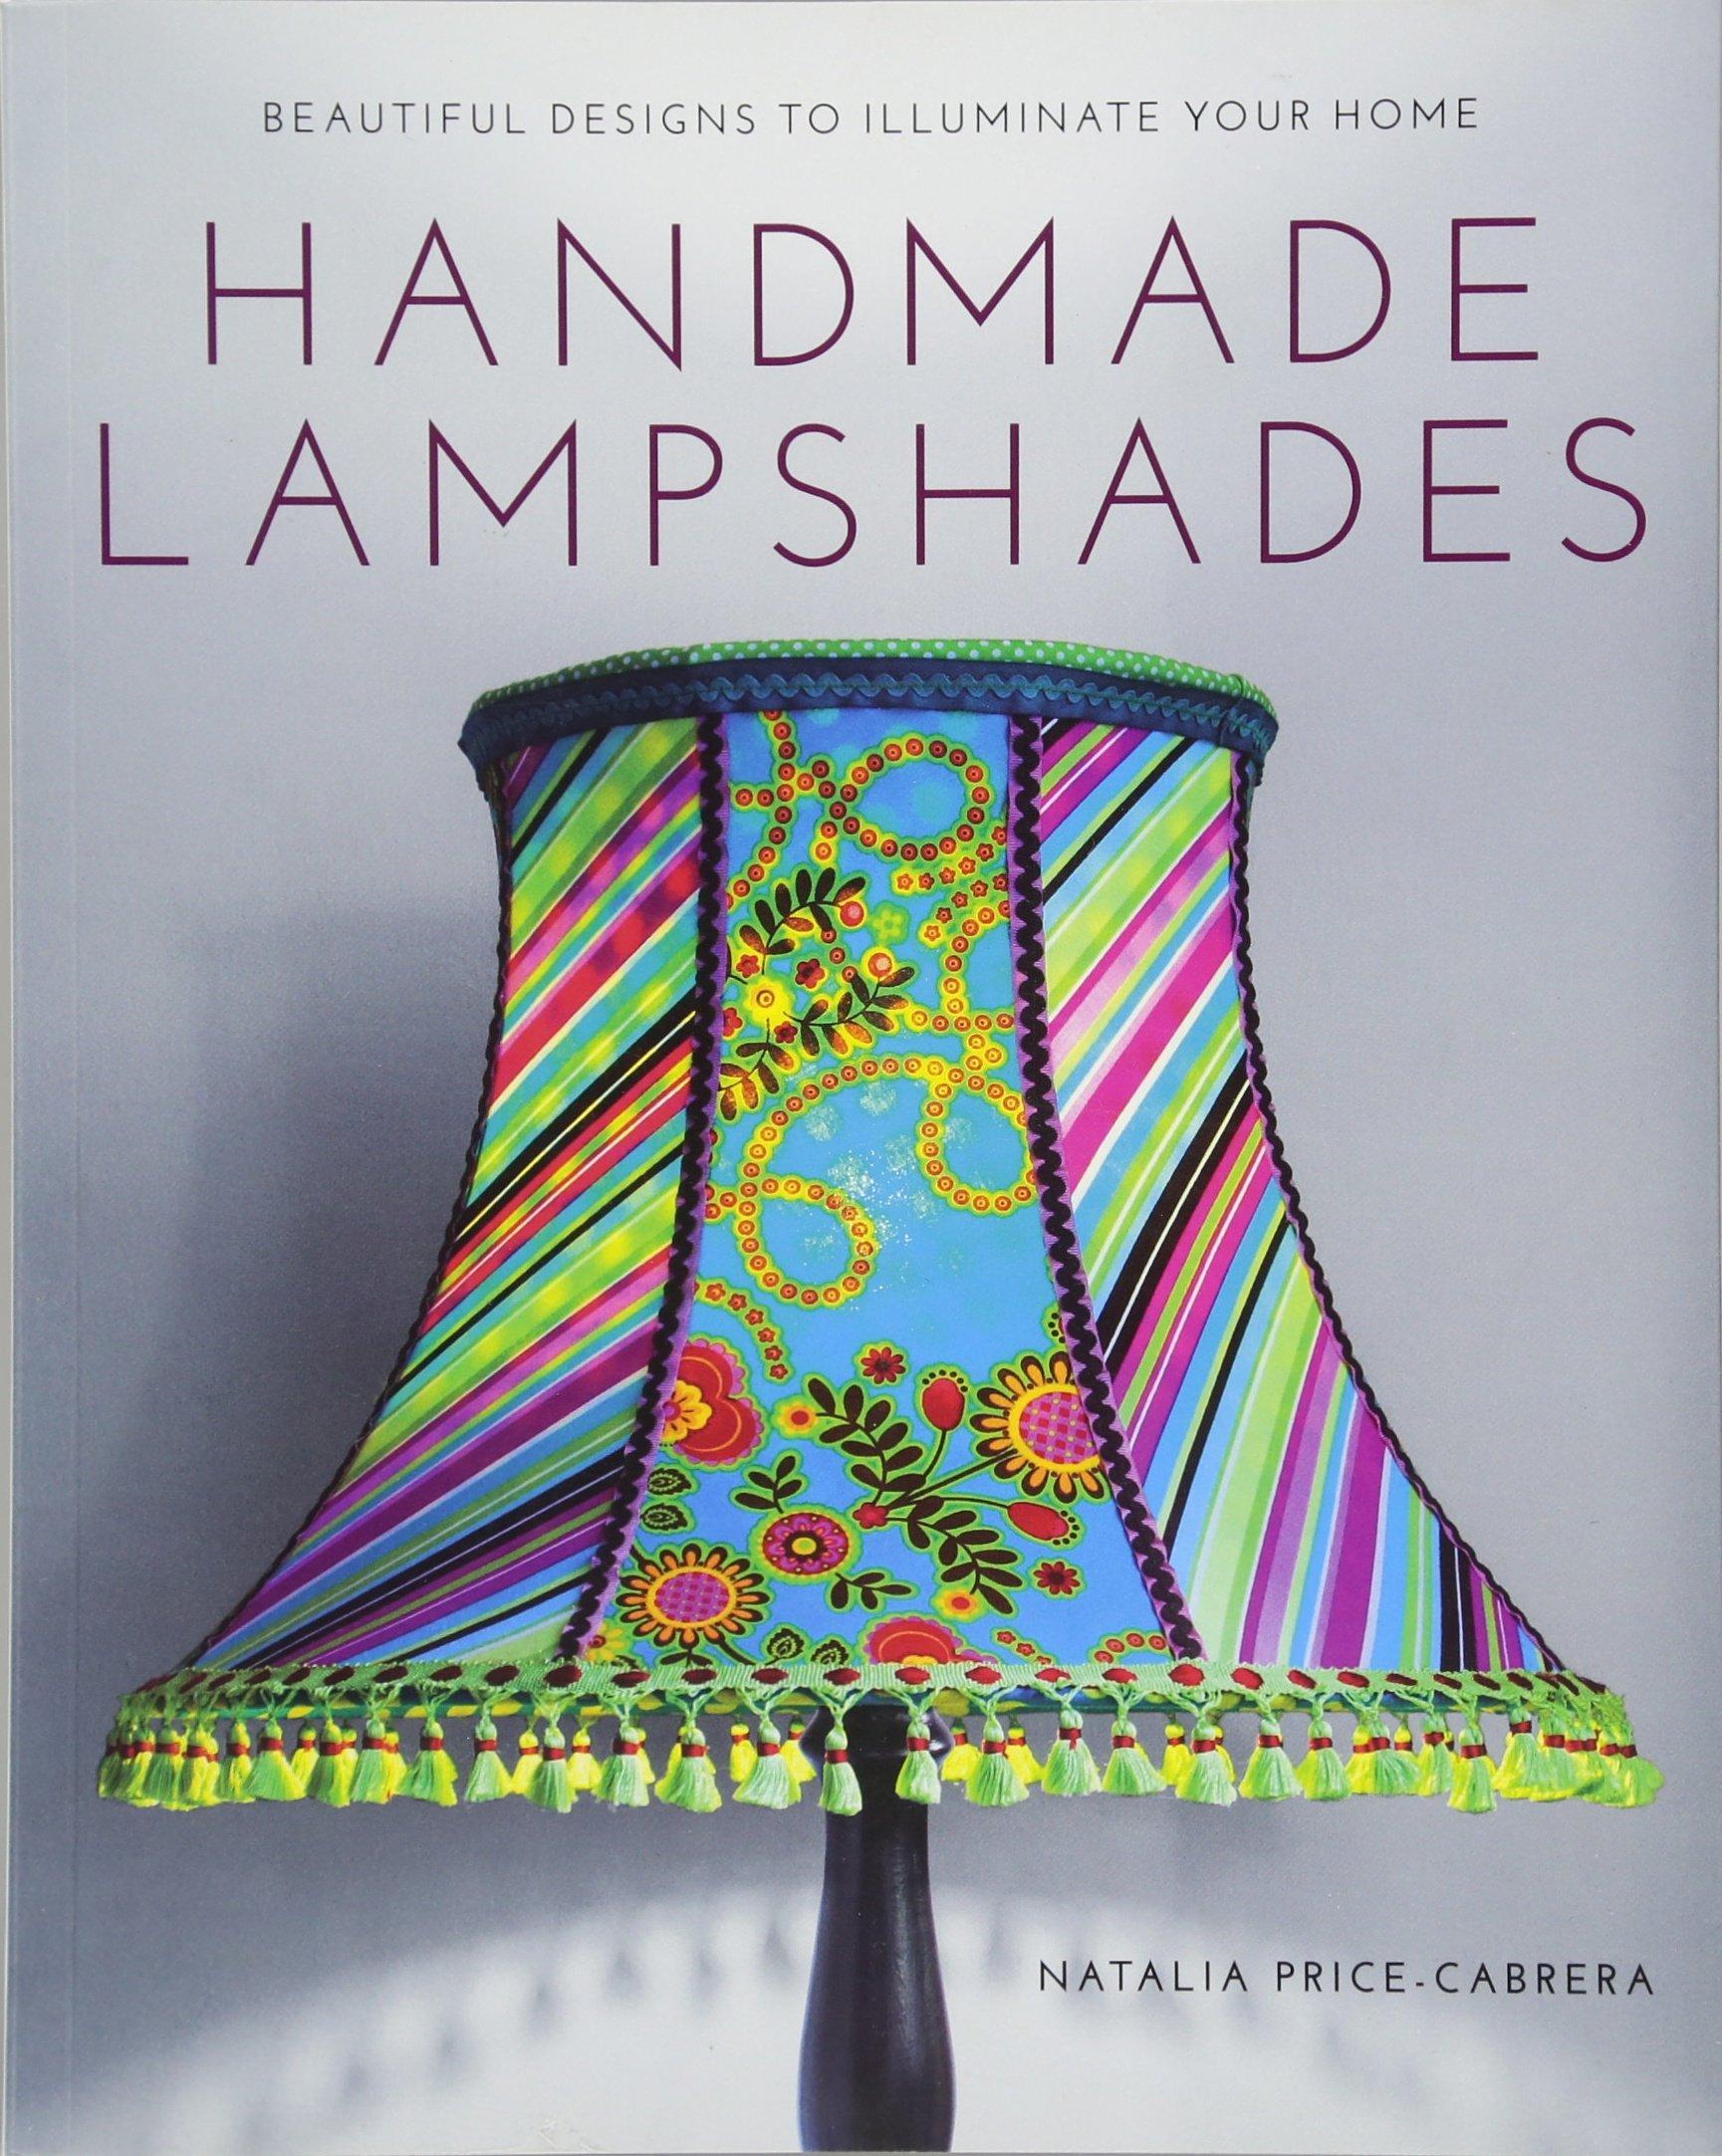 Handmade lampshades beautiful designs to illuminate your home handmade lampshades beautiful designs to illuminate your home amazon natalia price cabrera books aloadofball Choice Image